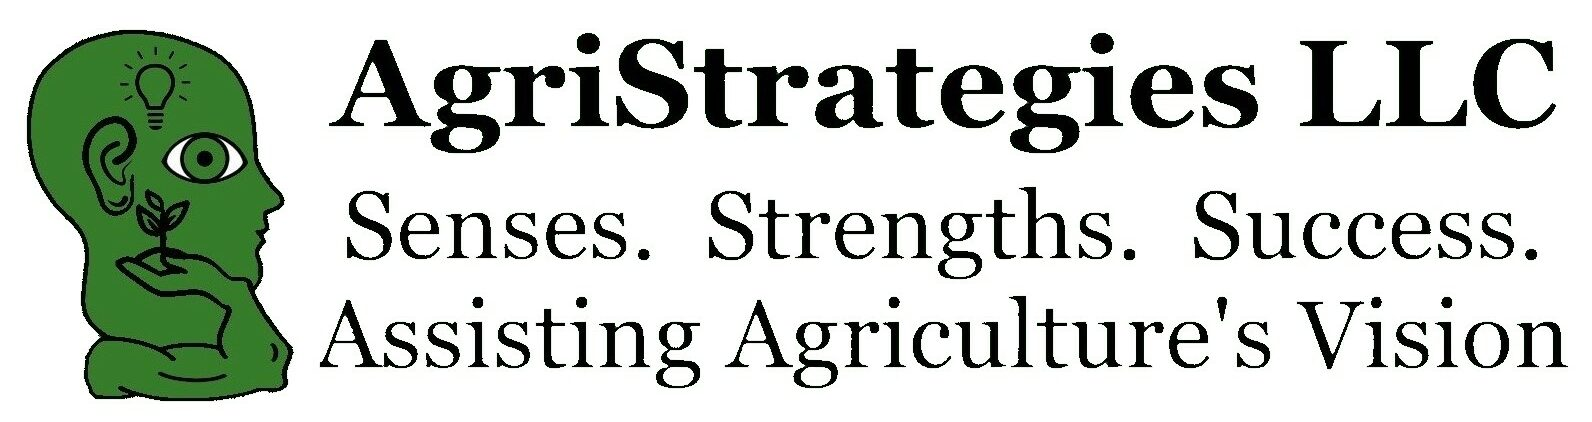 AgriStrategies LLC